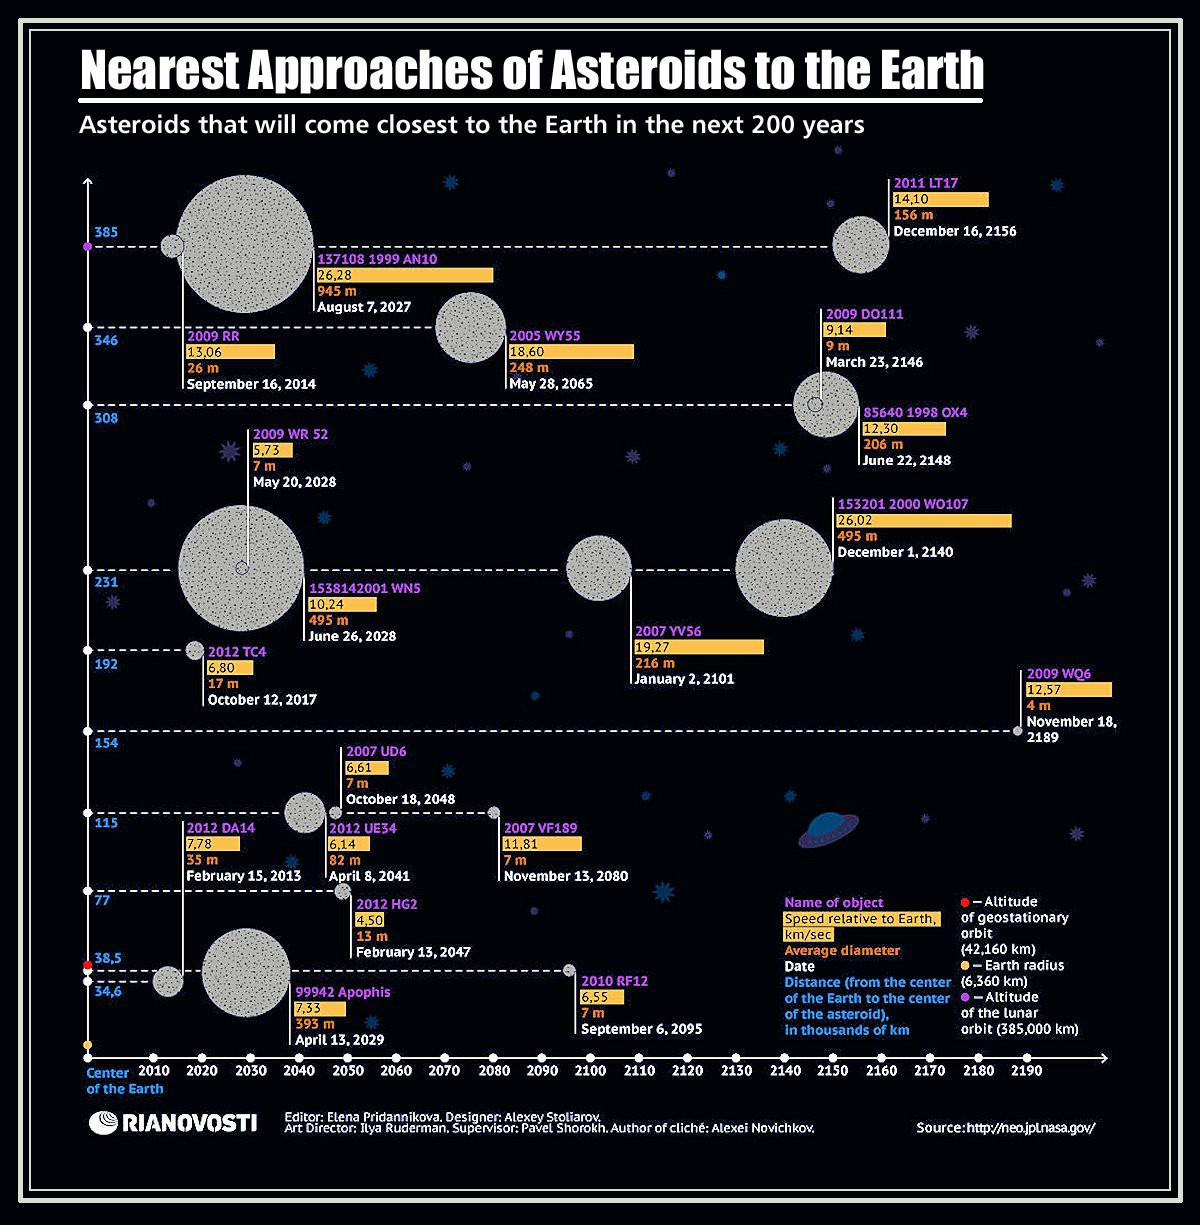 00 RIA-Novosti Infographics. Asteroids that Buzz Planet Earth. 2013